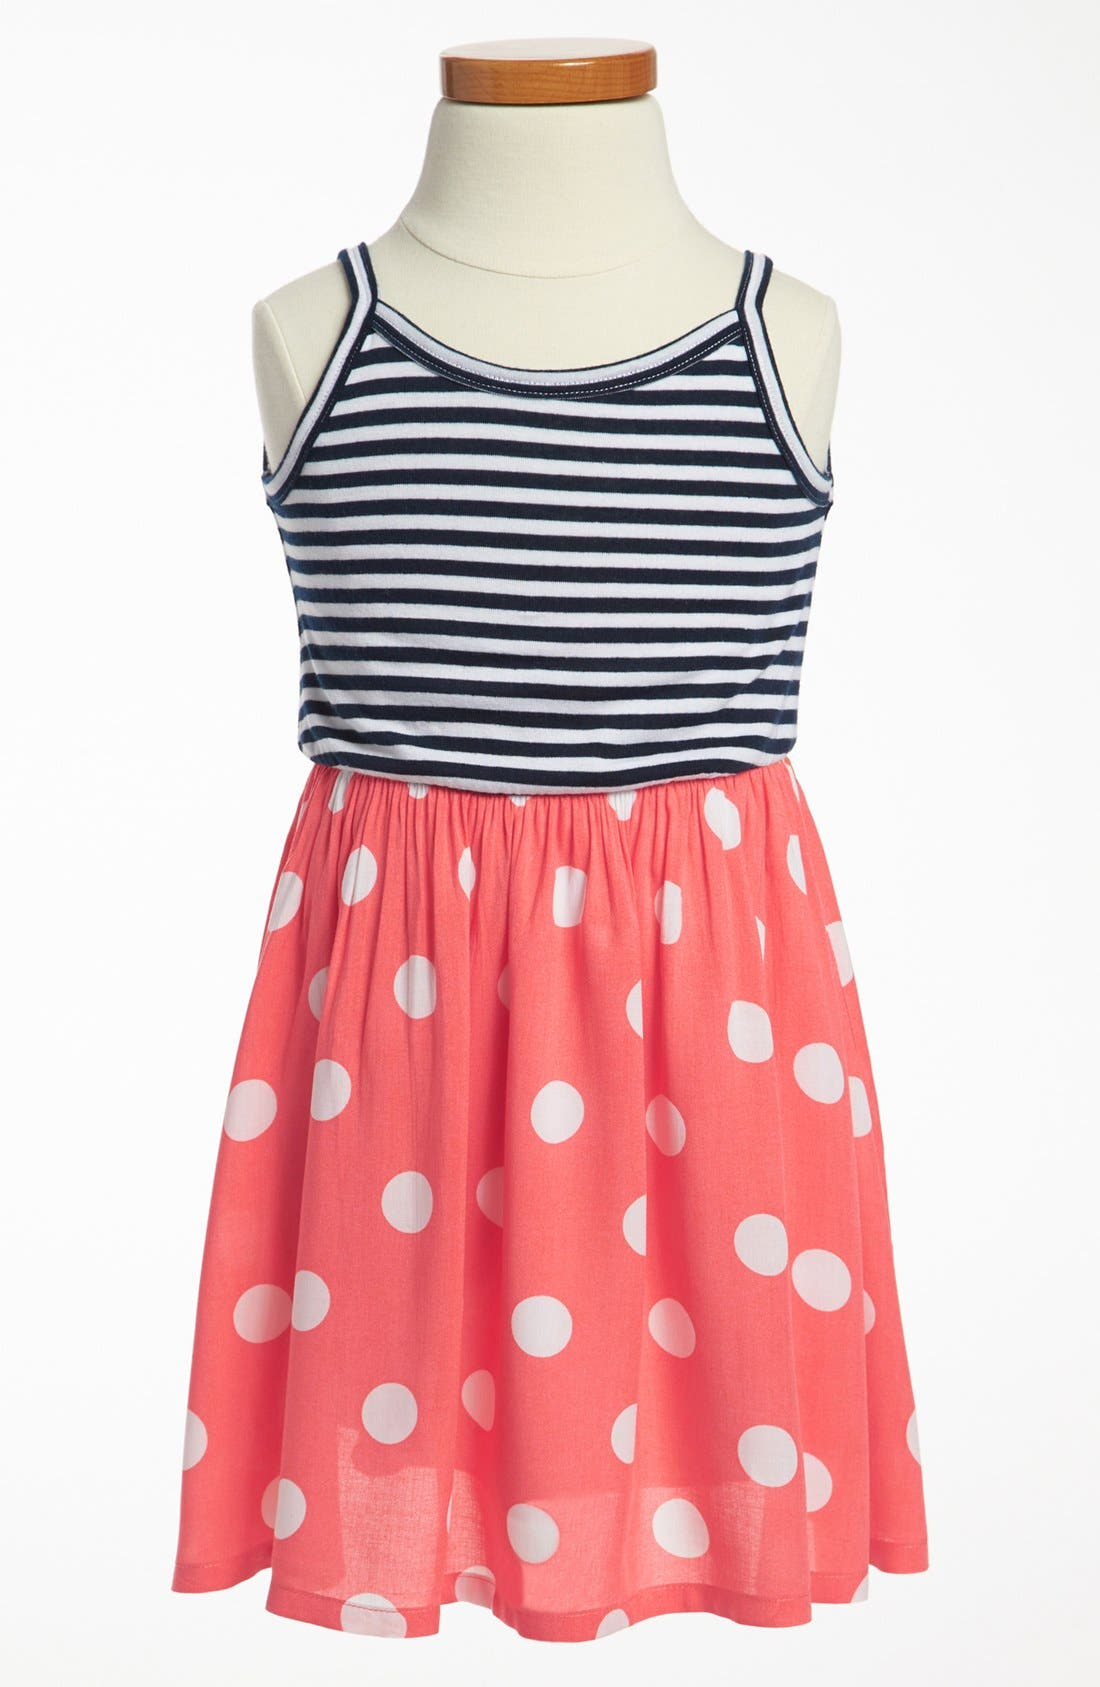 Main Image - Splendid 'Pool Party' Dress (Toddler)